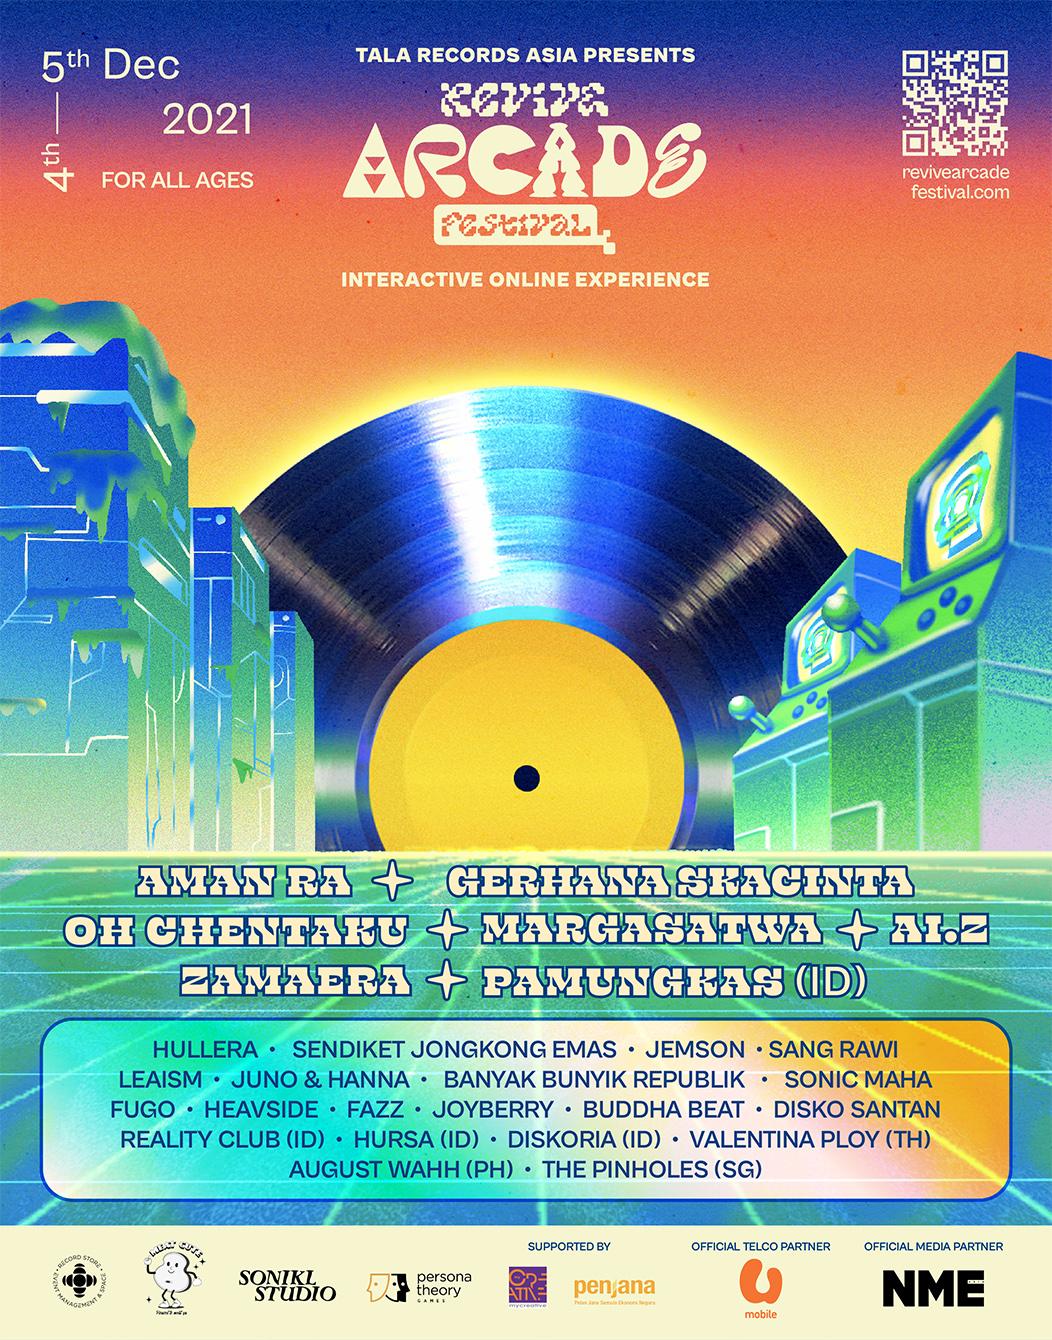 Revive Arcade Festival 2021 Malaysia Pamungkas Zamaera Aman Ra